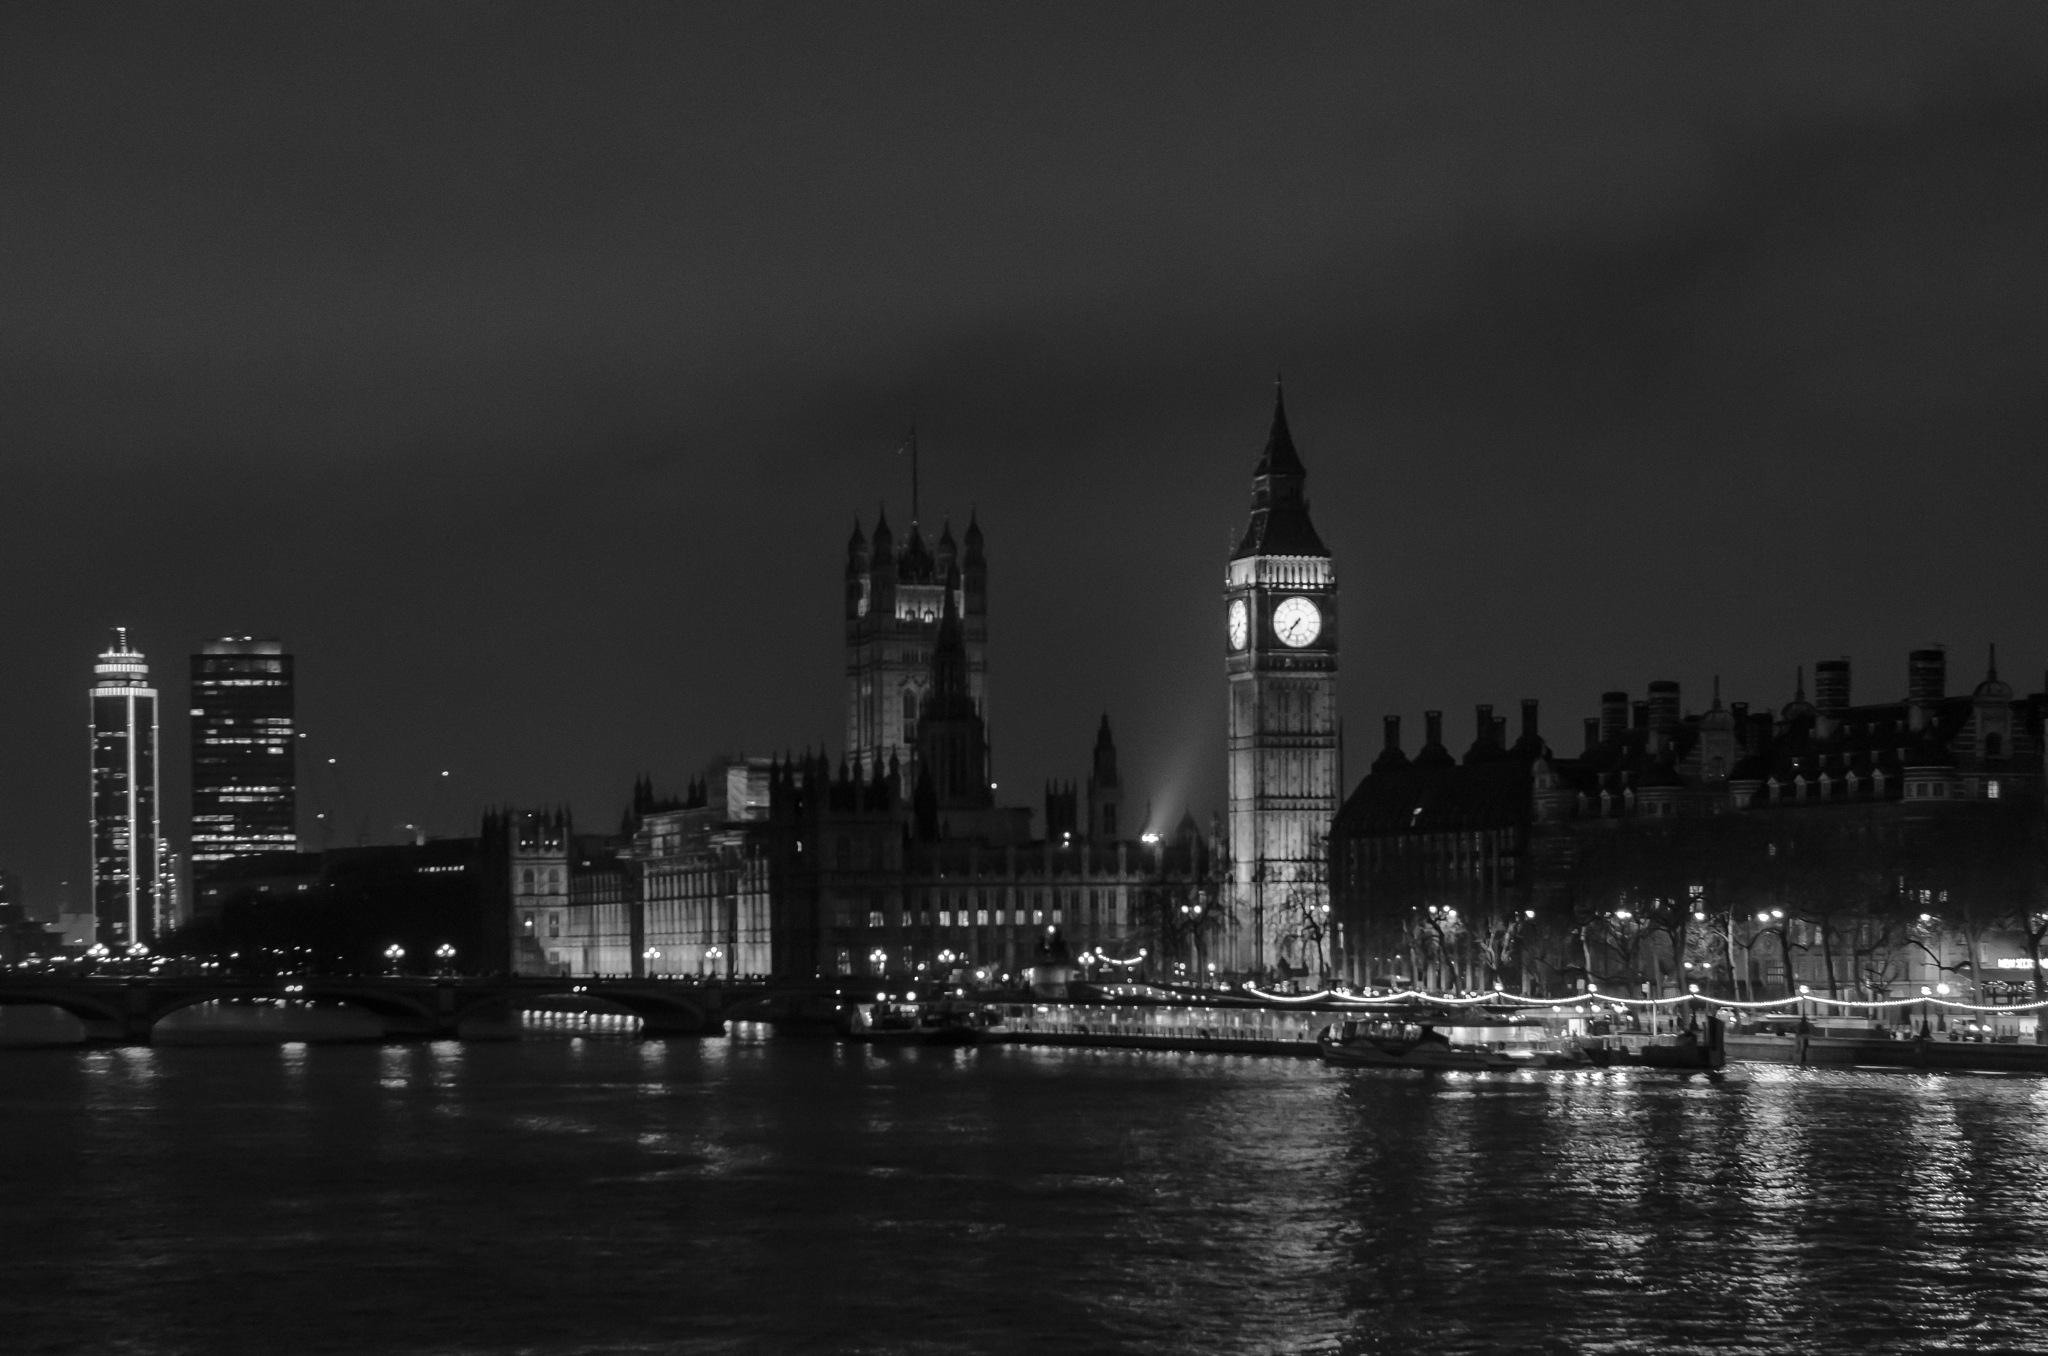 Night in London by Bogdan Mihaileanu